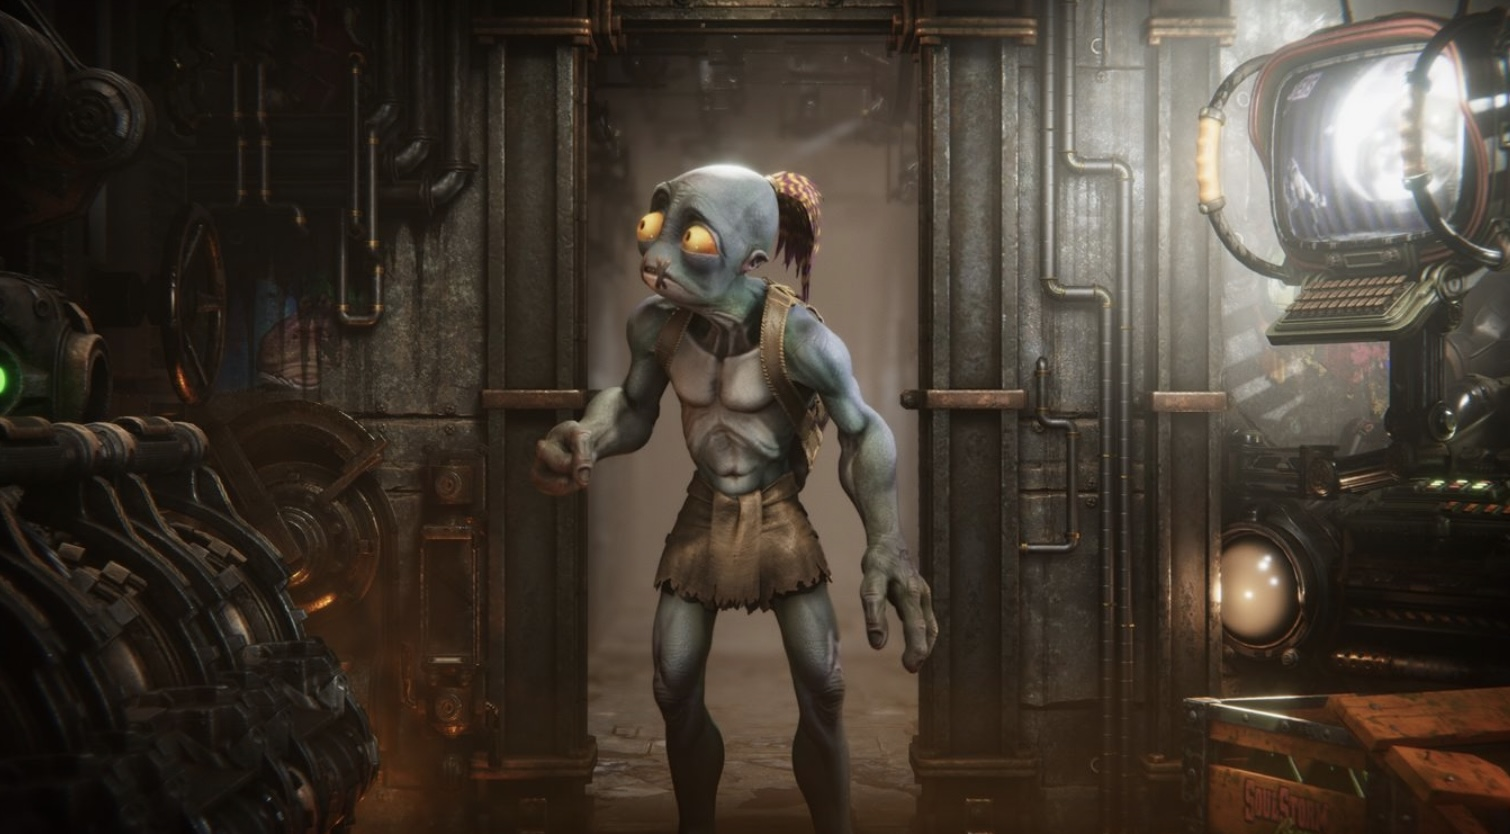 Oddworld Soulstorm Update 1.09 Patch Notes